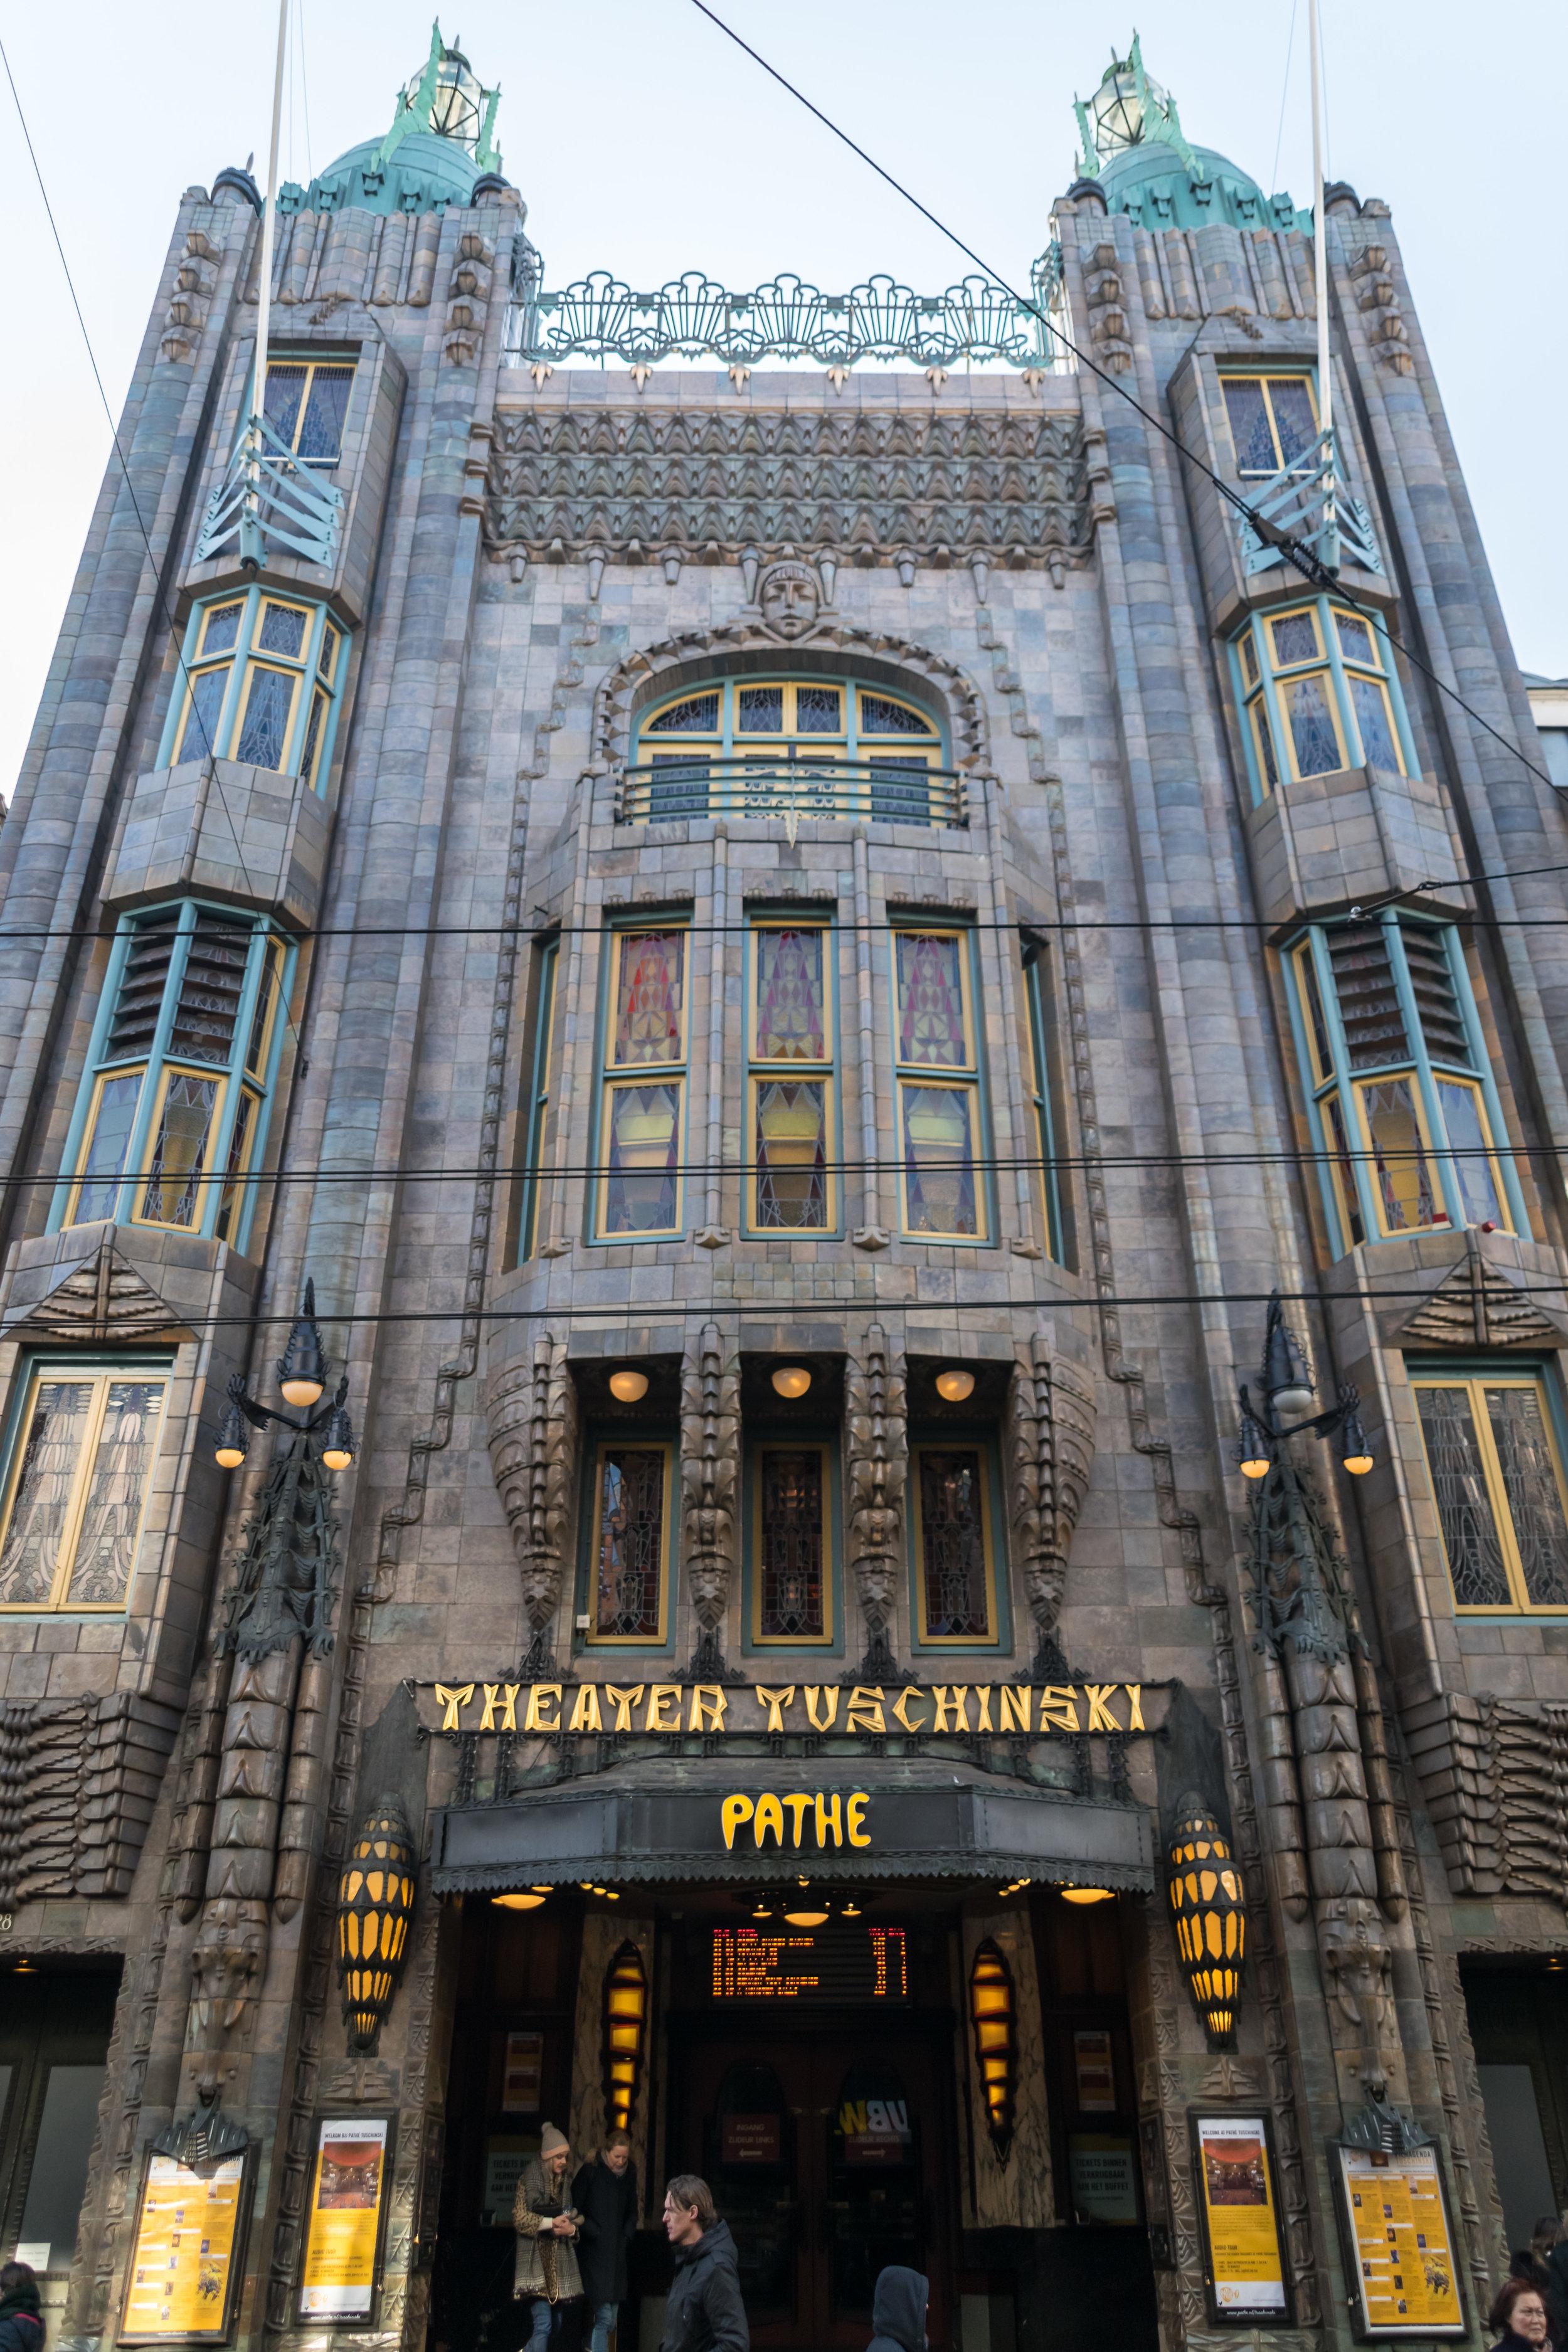 the 1921 Pathé Tuschinski movie theater